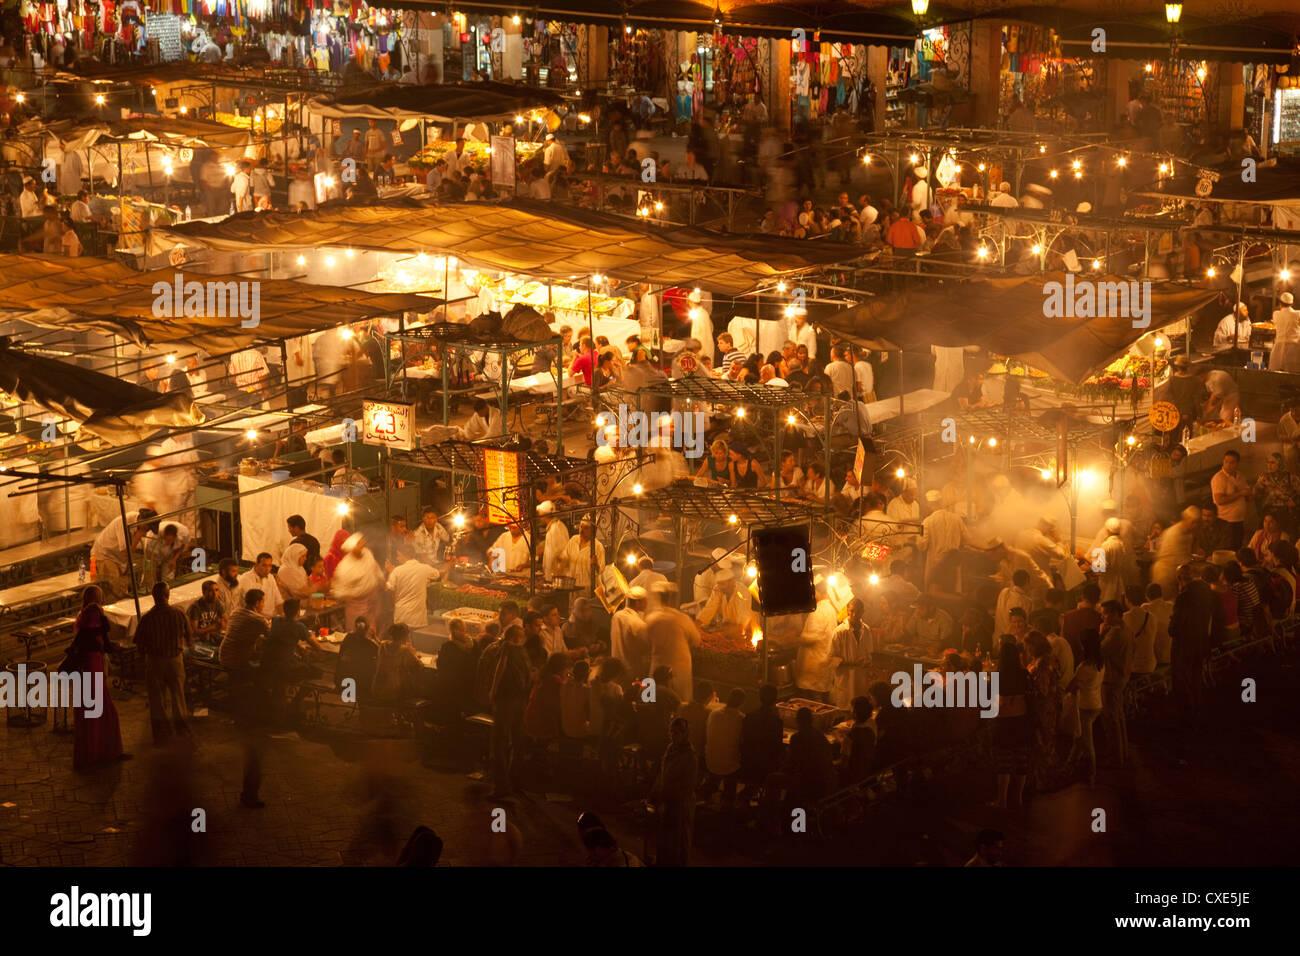 Food market in Djemaa el-Fna, Marrakech, Morocco, North Africa, Africa Stock Photo